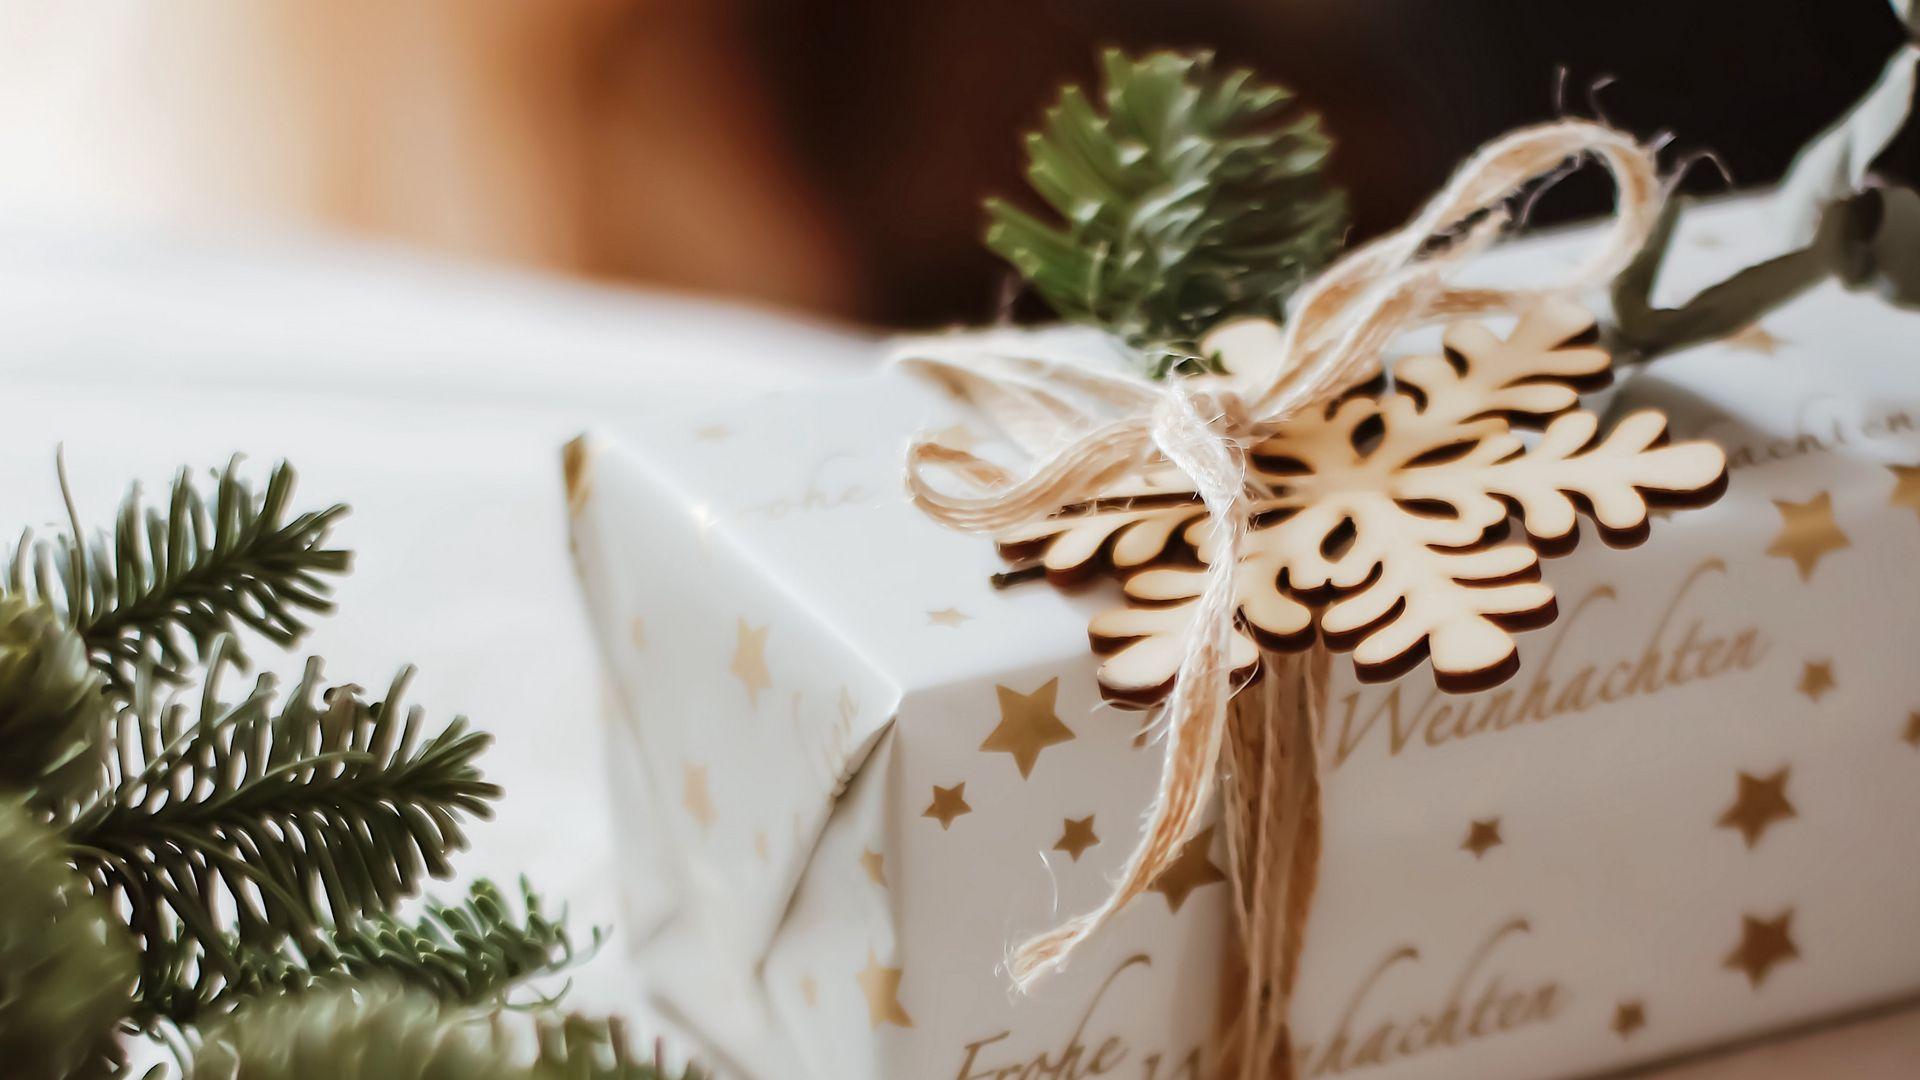 1920x1080 Wallpaper gift, box, holiday, christmas, new year